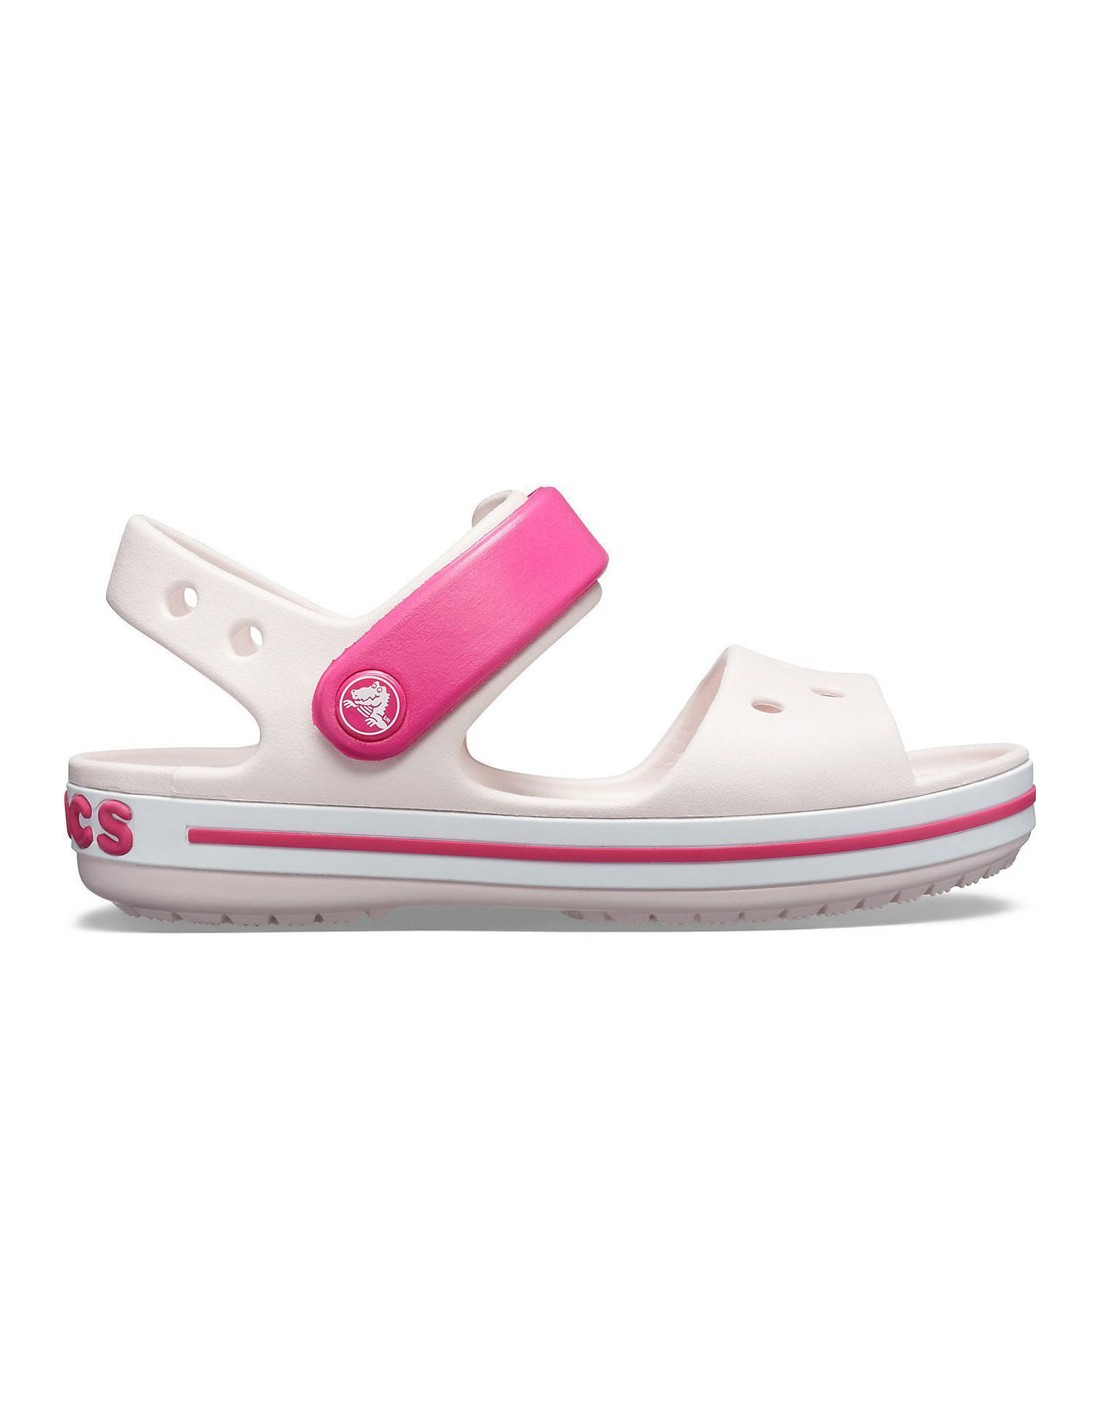 nuovo di zecca 6dee1 2c6fc Sandali Crocs Crocband bambina barely rosa